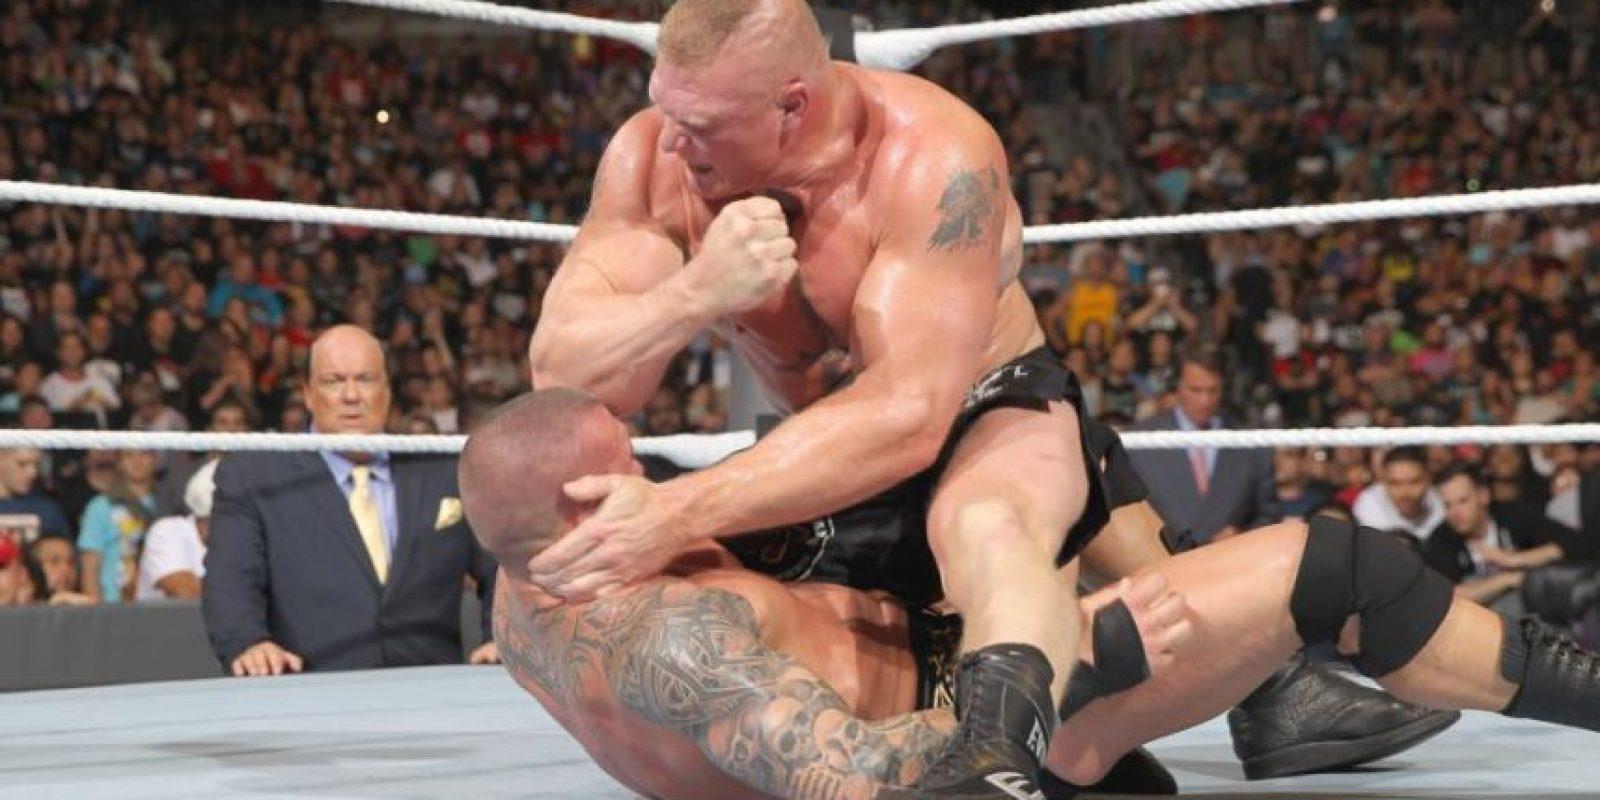 Brock Lesnar le propinó una brutal golpiza a Randy Orton en SummerSlam Foto:WWE. Imagen Por: